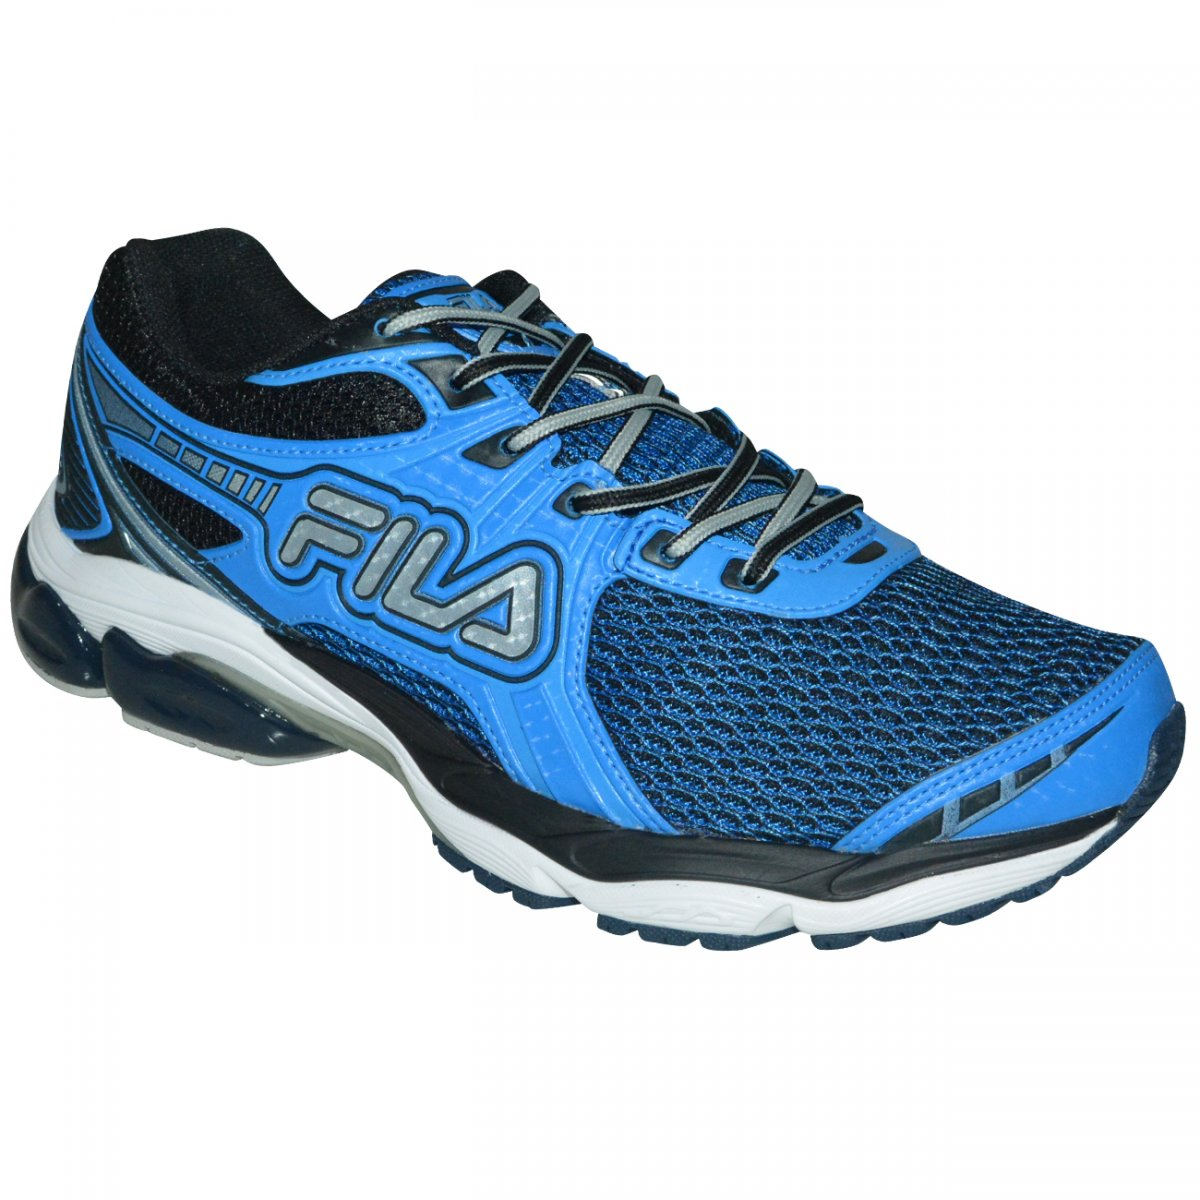 d5791f0b2f8 Tenis Fila Energized Pad 2.0 765087 - Azul preto prata - Chuteira Nike